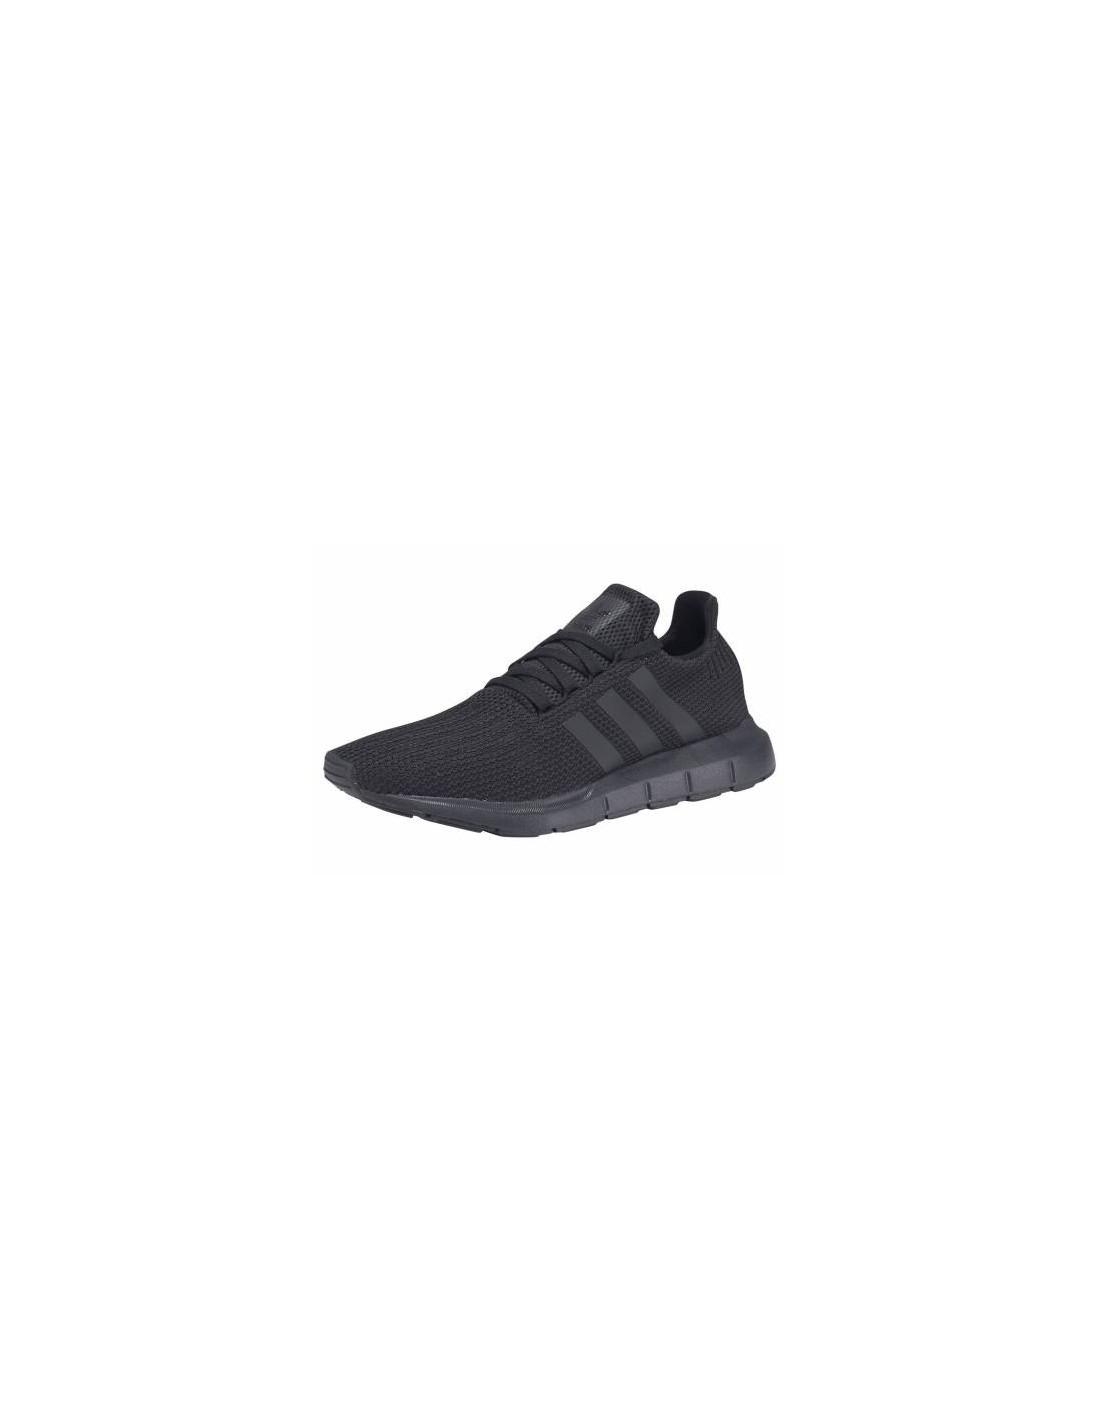 reputable site 2f641 00ee5 ... Adidas Originals Swift Run 10 Black CG4111 ...